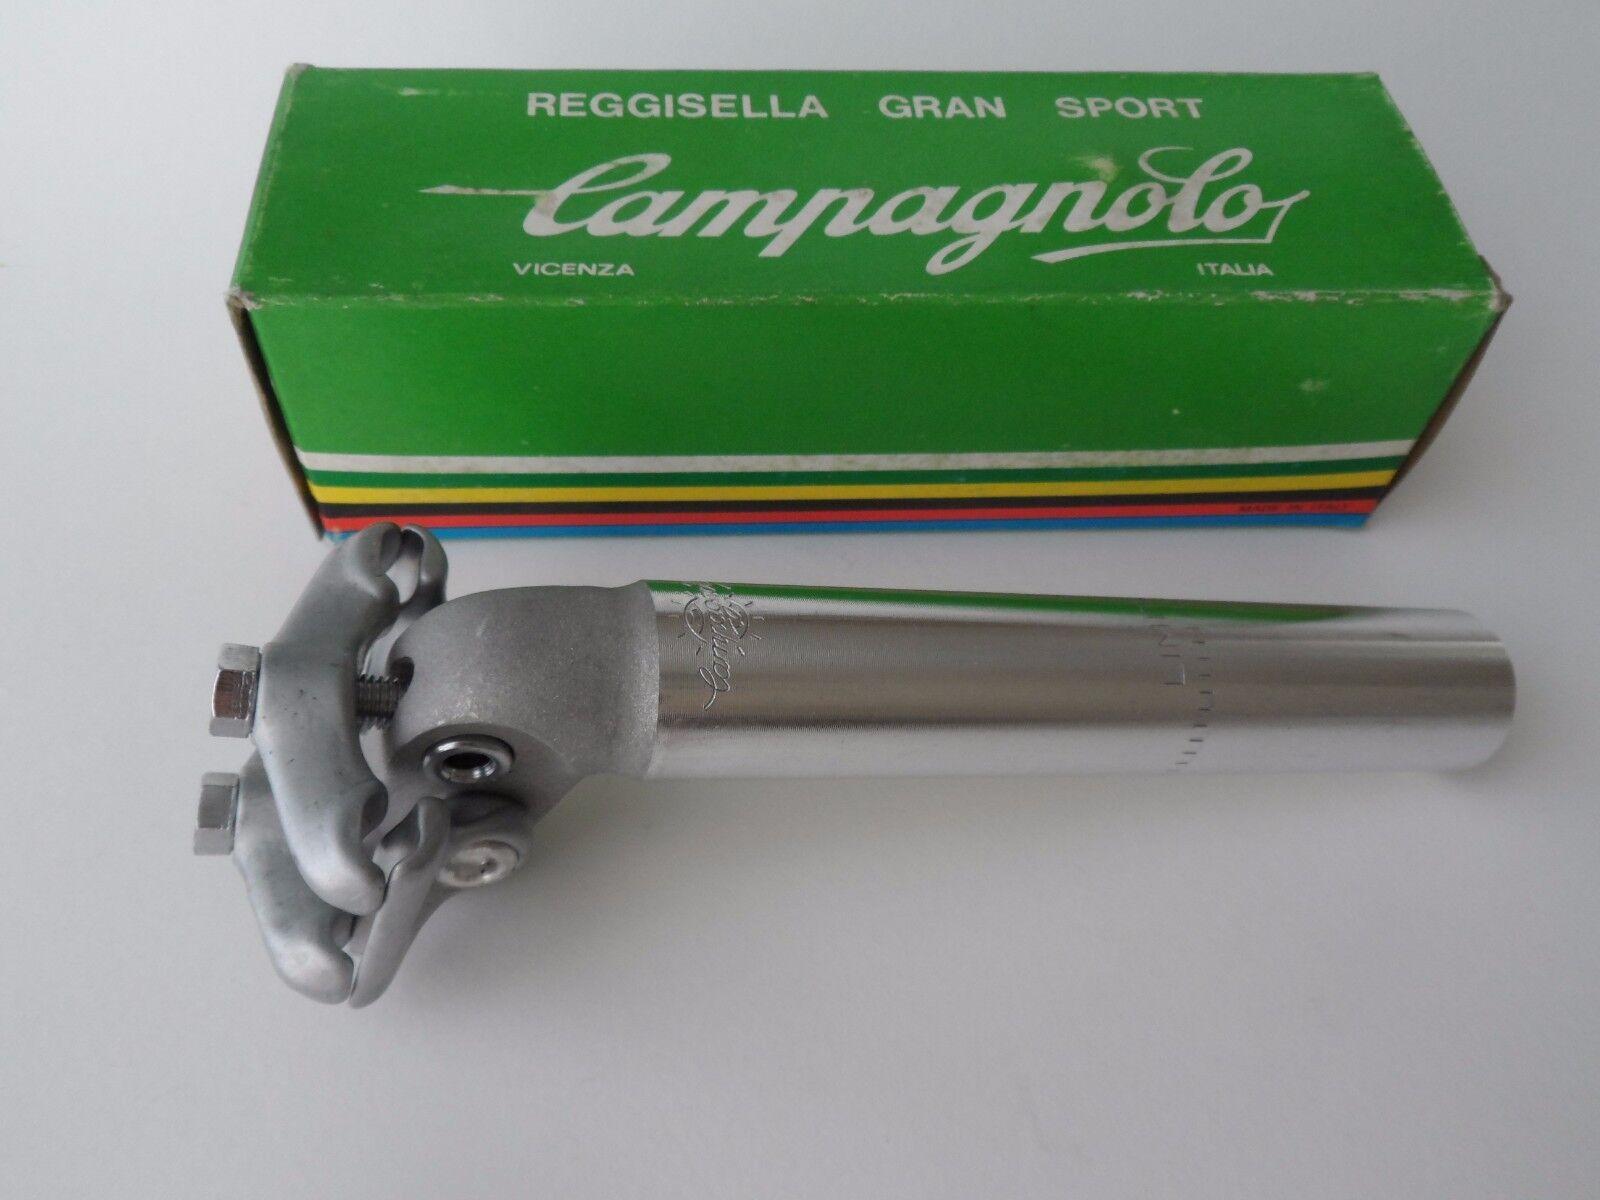 NOS Vintage 1970s Campagnolo Gran Sport  short alloy seatpost 26.2mm  reasonable price